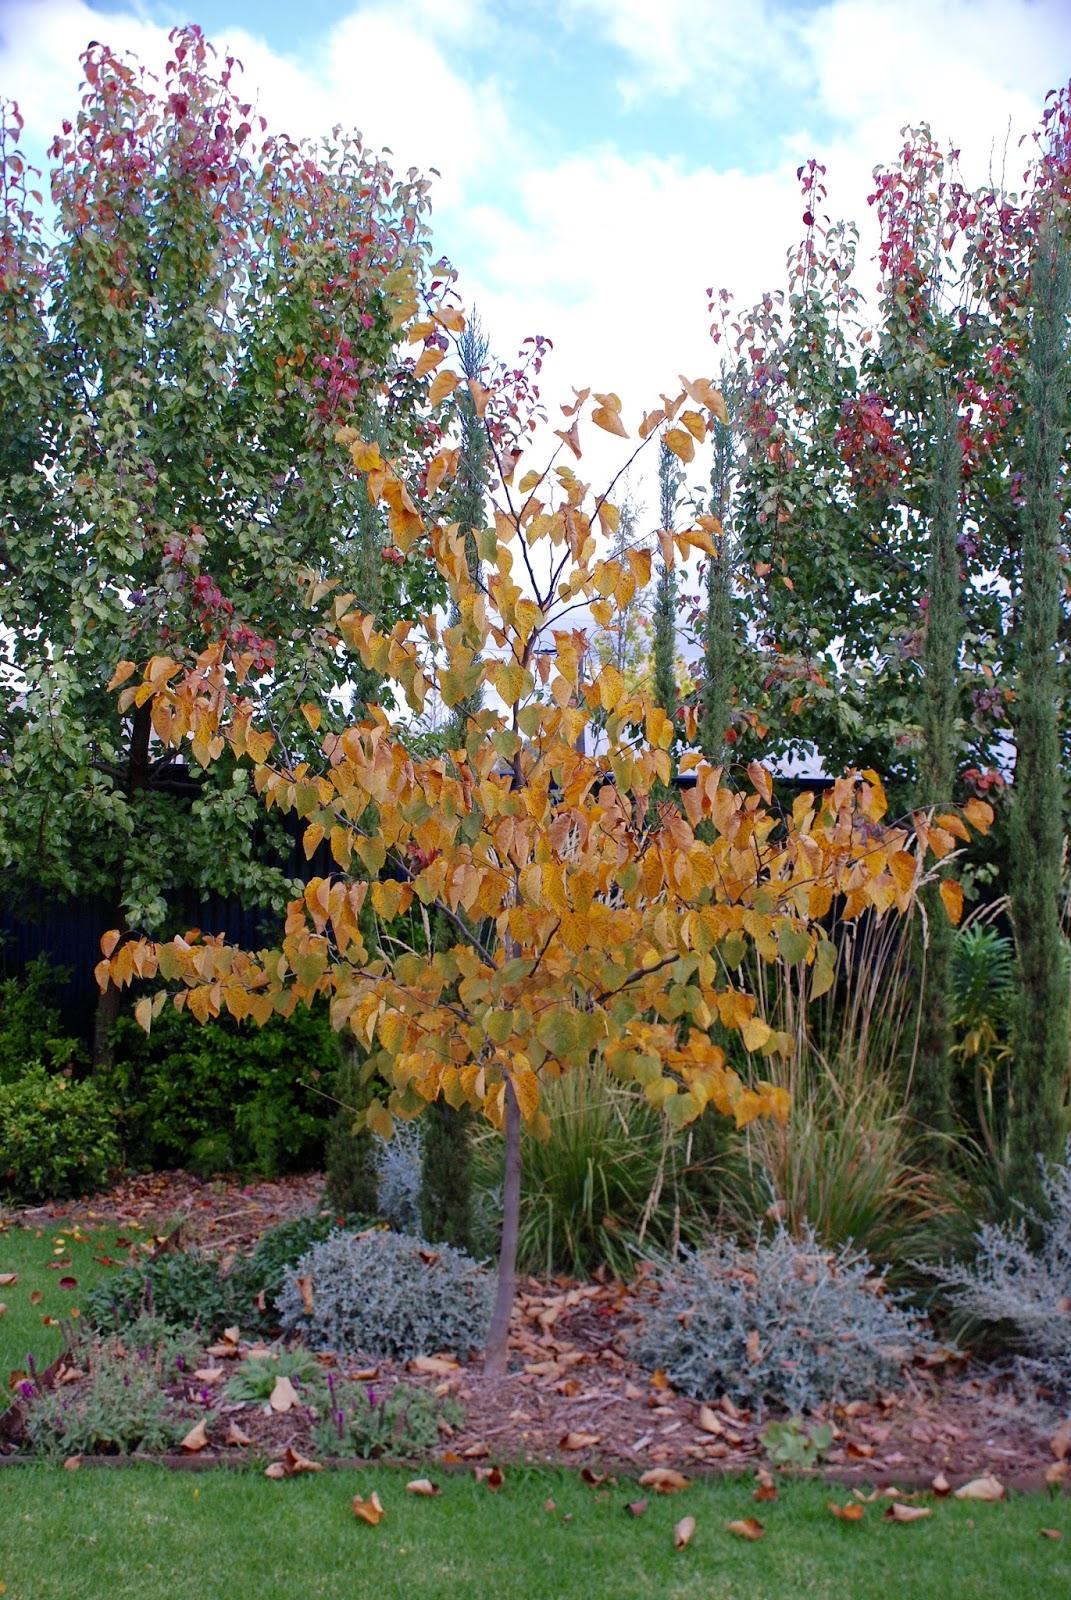 Adelaide Villa: Autumn and Winter Gardening